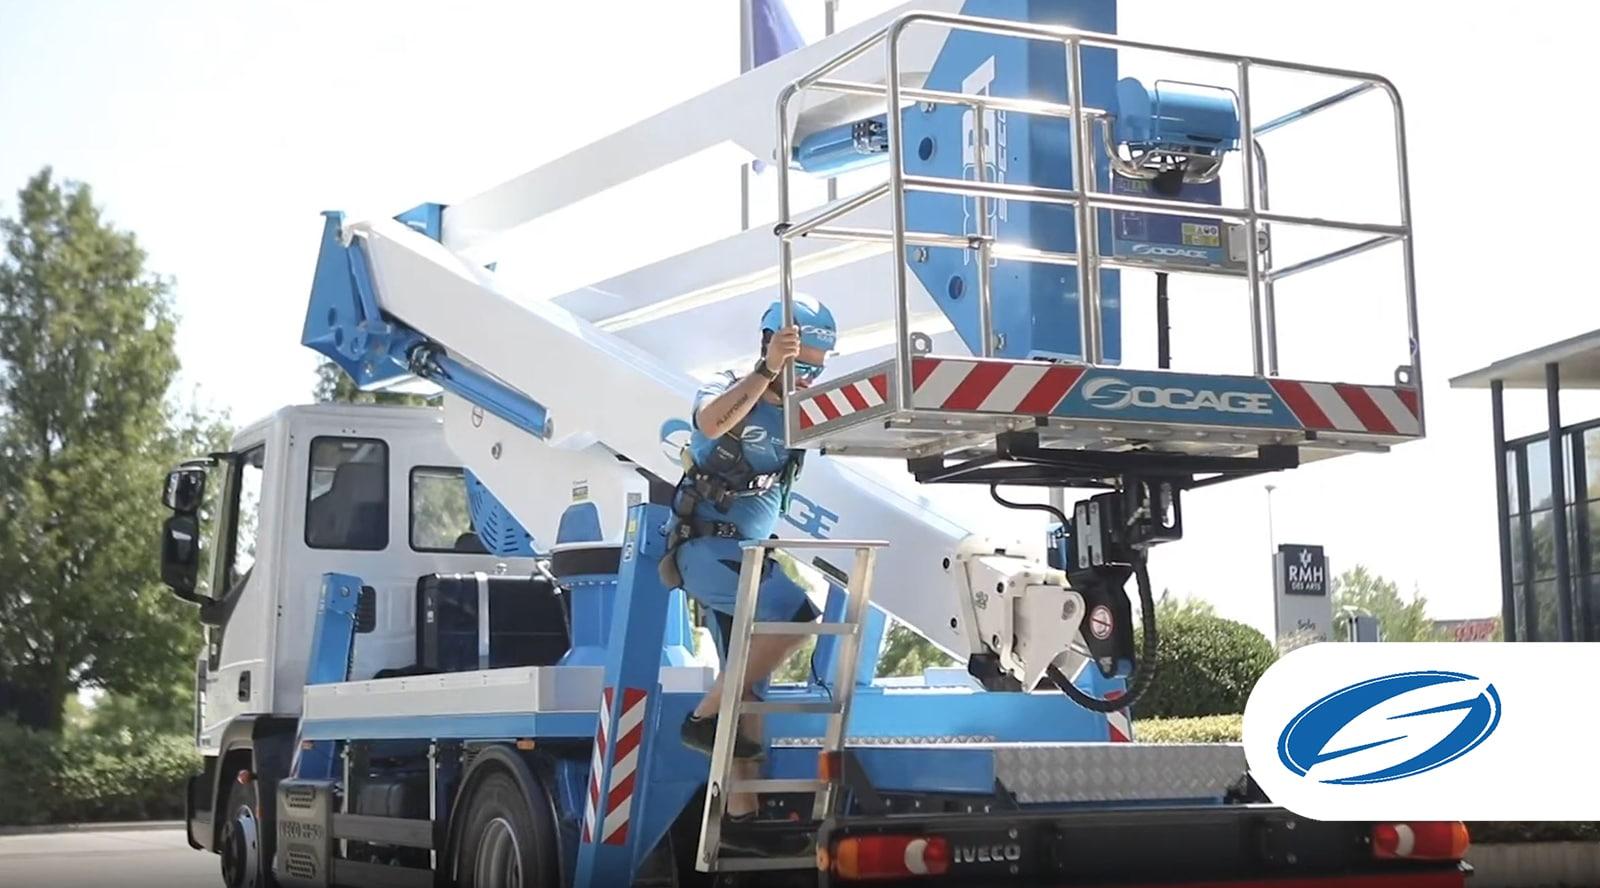 Truck-mounted boom lift 28DA bucket